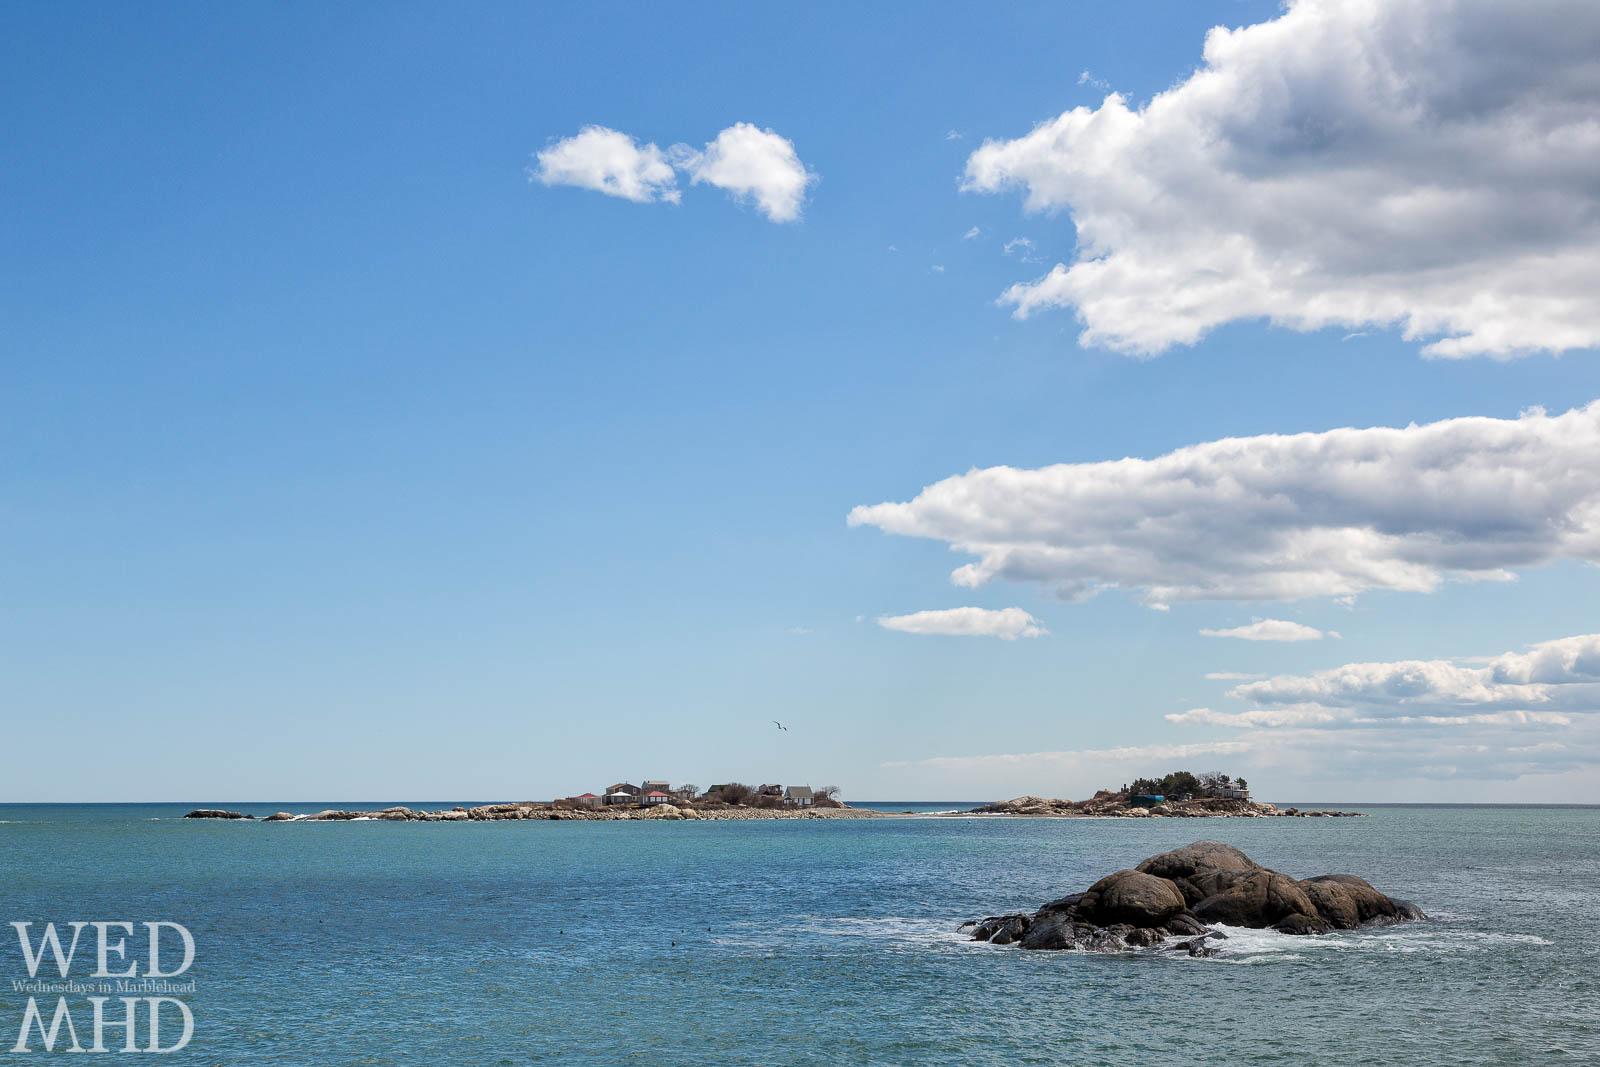 Tinkers Island and the Deep Blue Sea